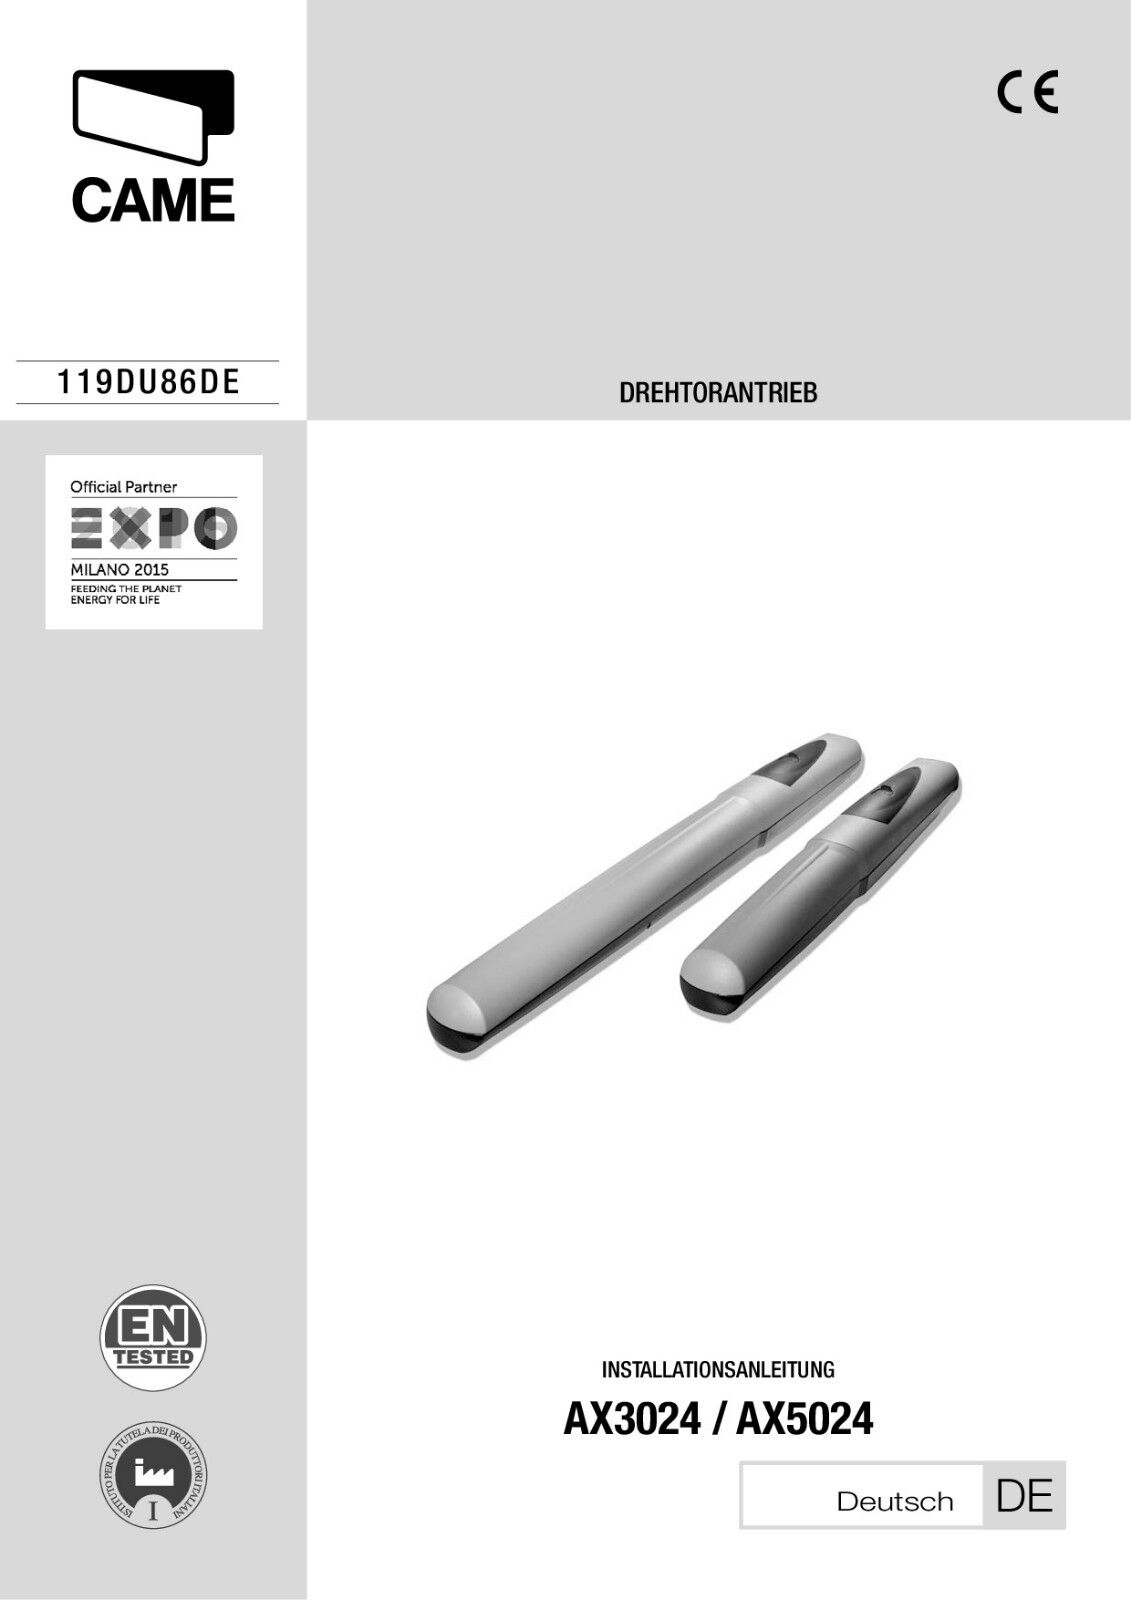 CAME AXO AX5024 SET 1 flügl. Torantrieb bis 5 5 5 Meter, inkl. Steuerung ZLJ14 c02526